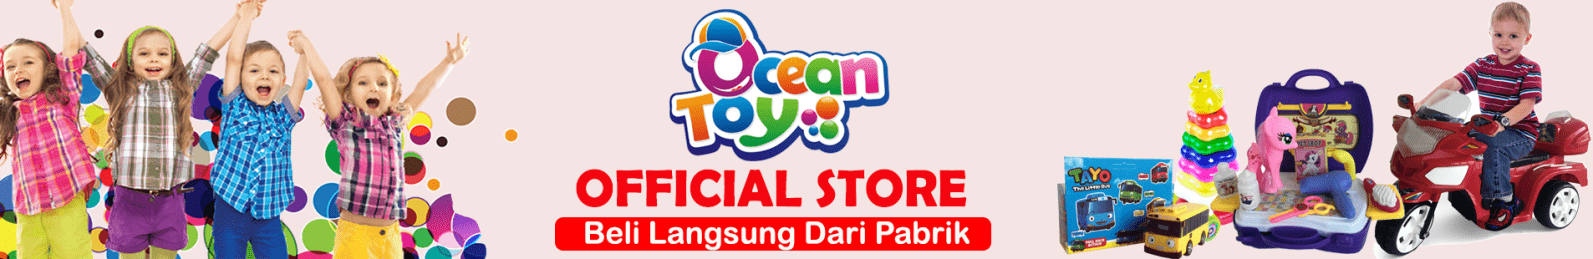 Ocean Toy 2